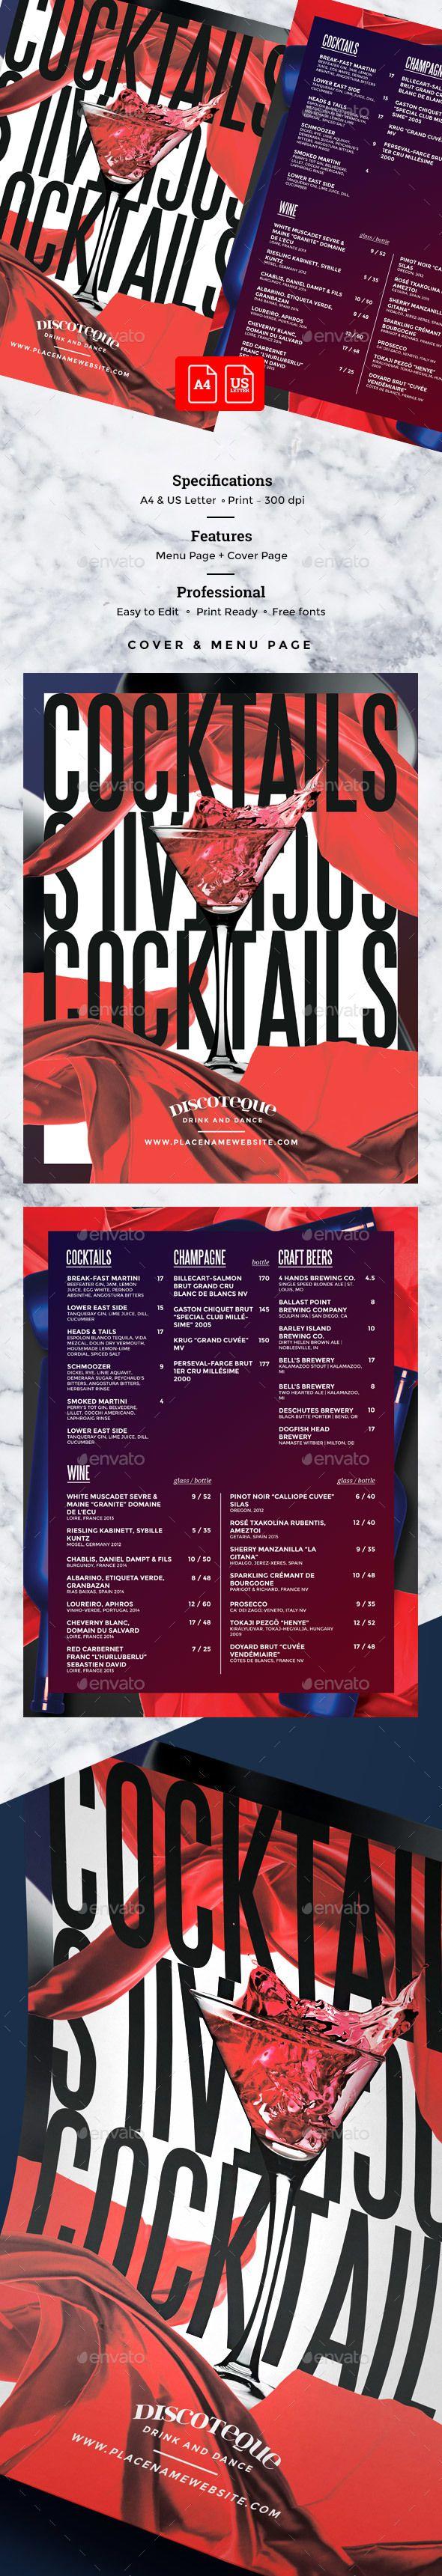 Cocktail Drinks Menu - #Food Menus #Print Templates Download here: https://graphicriver.net/item/cocktail-drinks-menu/20112180?ref=alena994